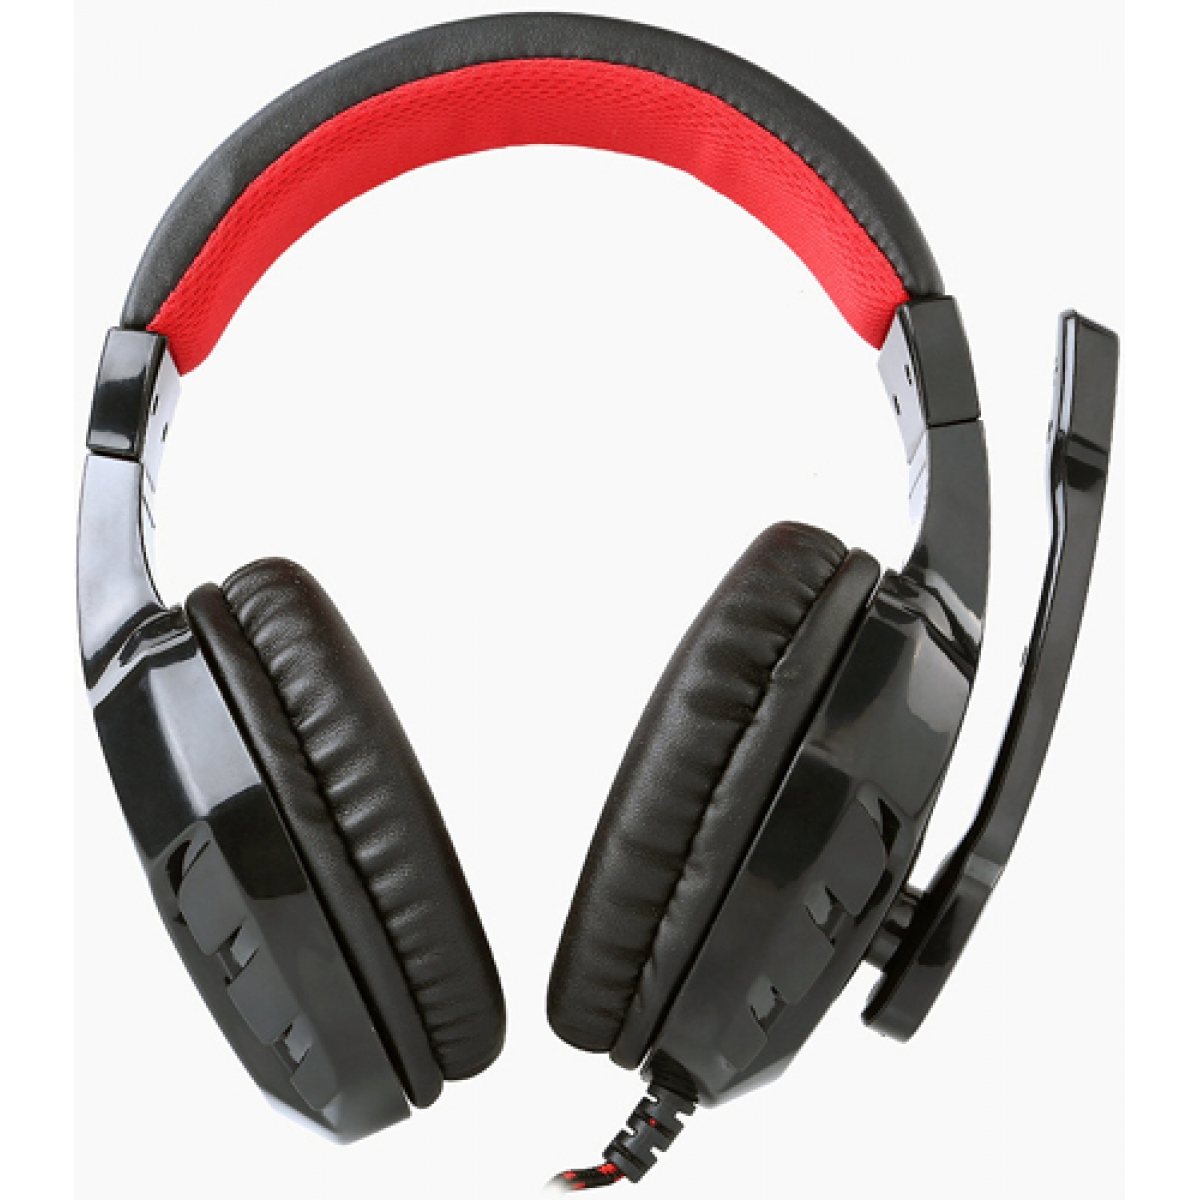 Headset Gamer Marvo Scorpion H8329 Preto/Vermelho